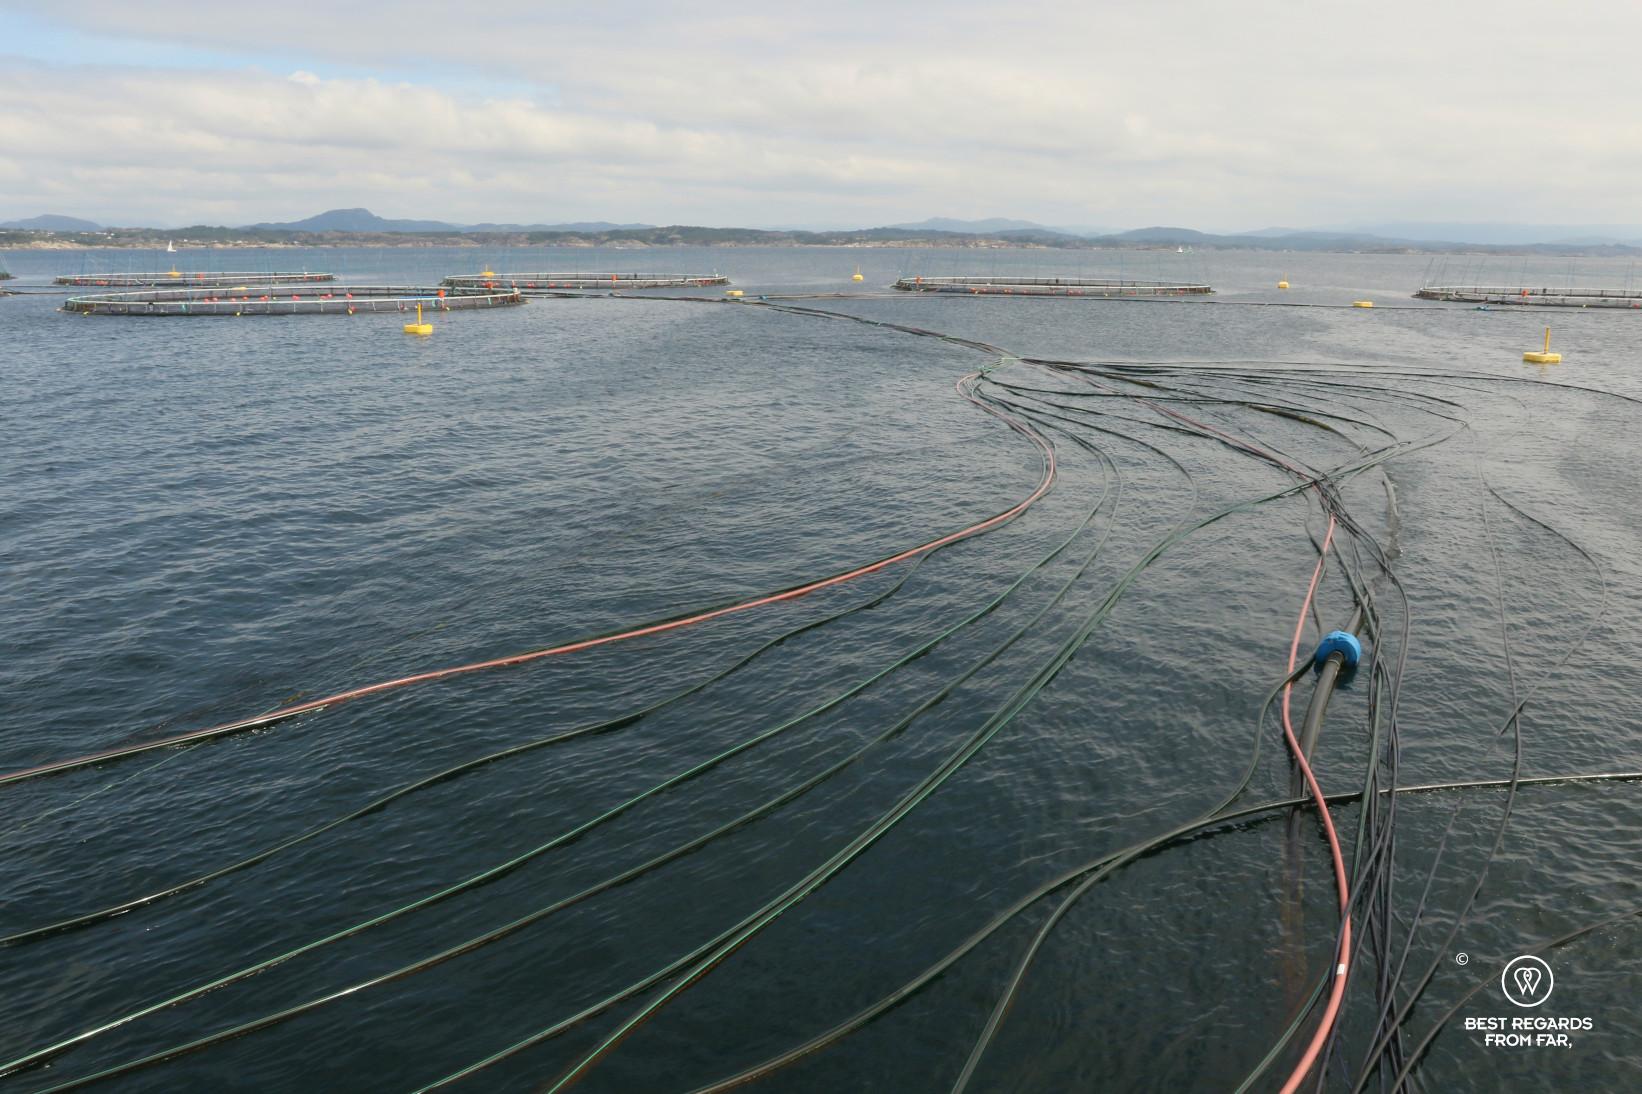 Feed lines in a Leroy salmon farm off Bergen, Norway